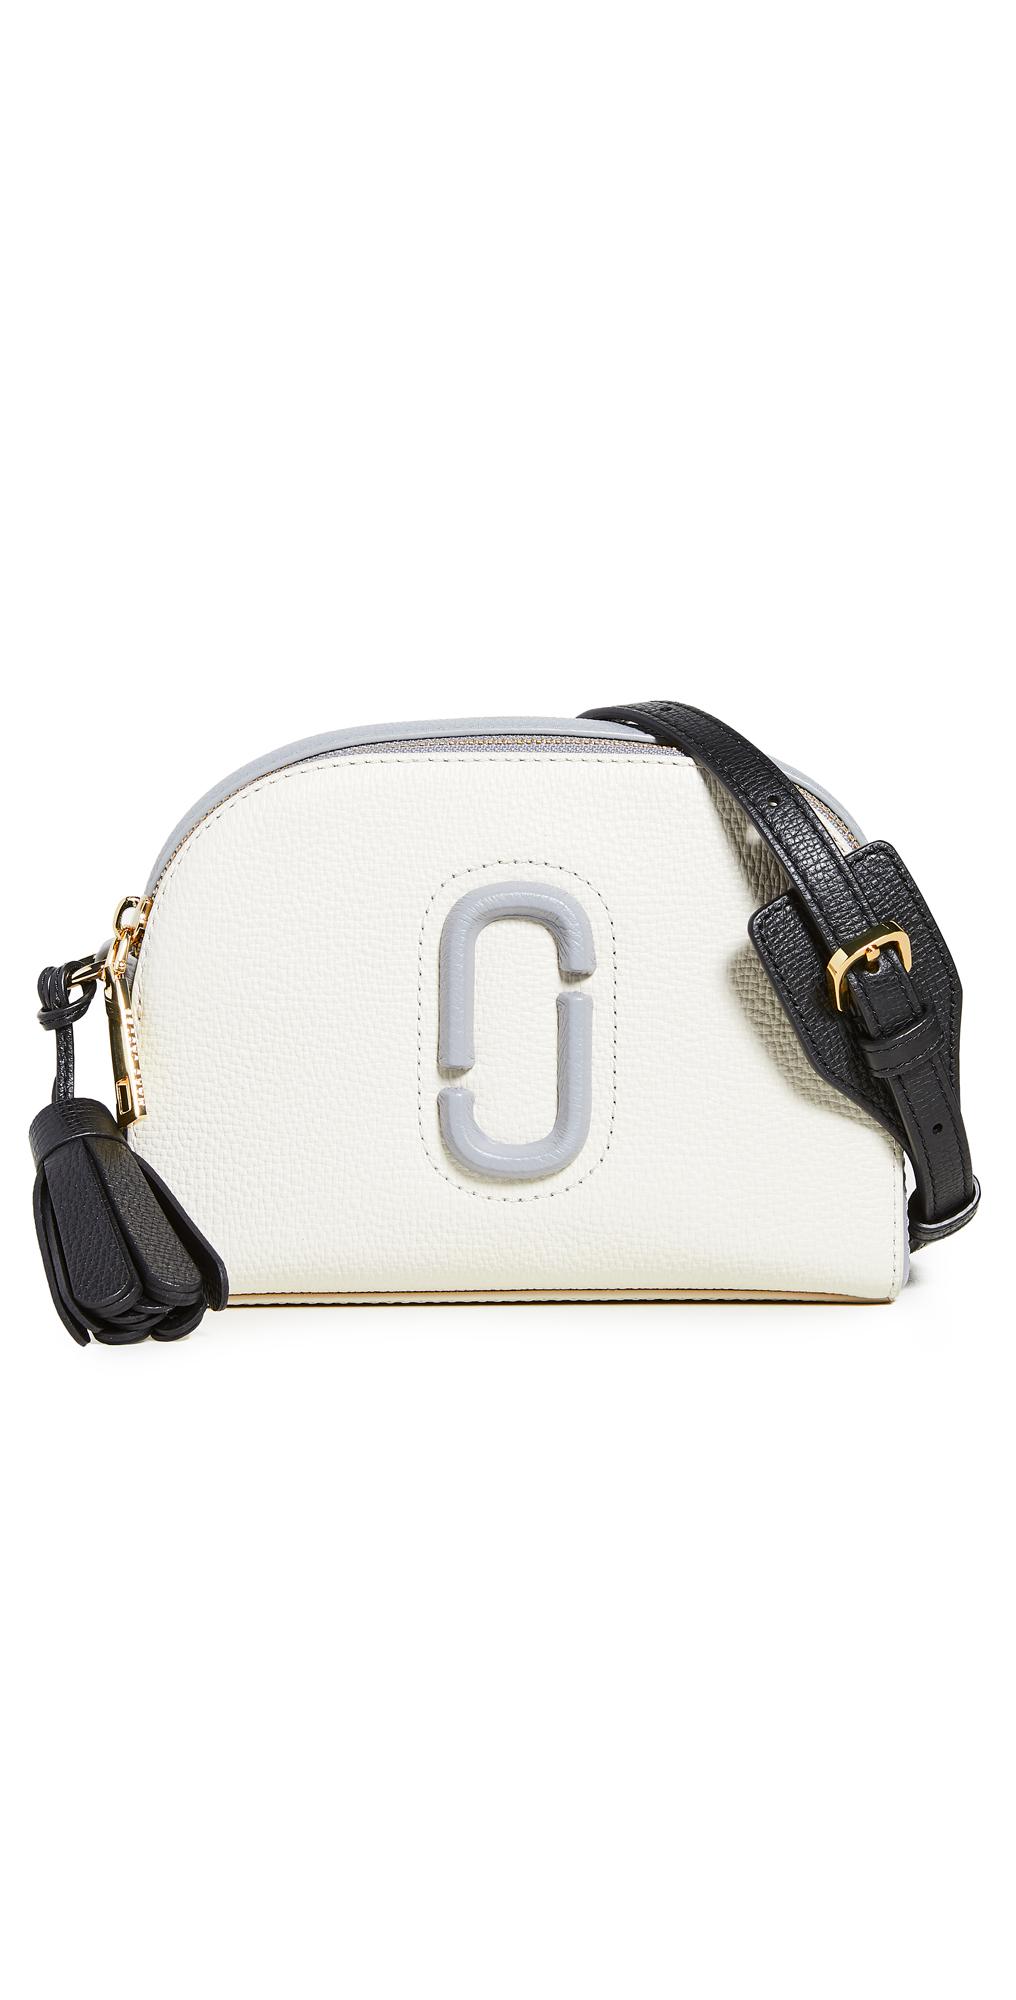 The Marc Jacobs Shutter Crossbody Bag